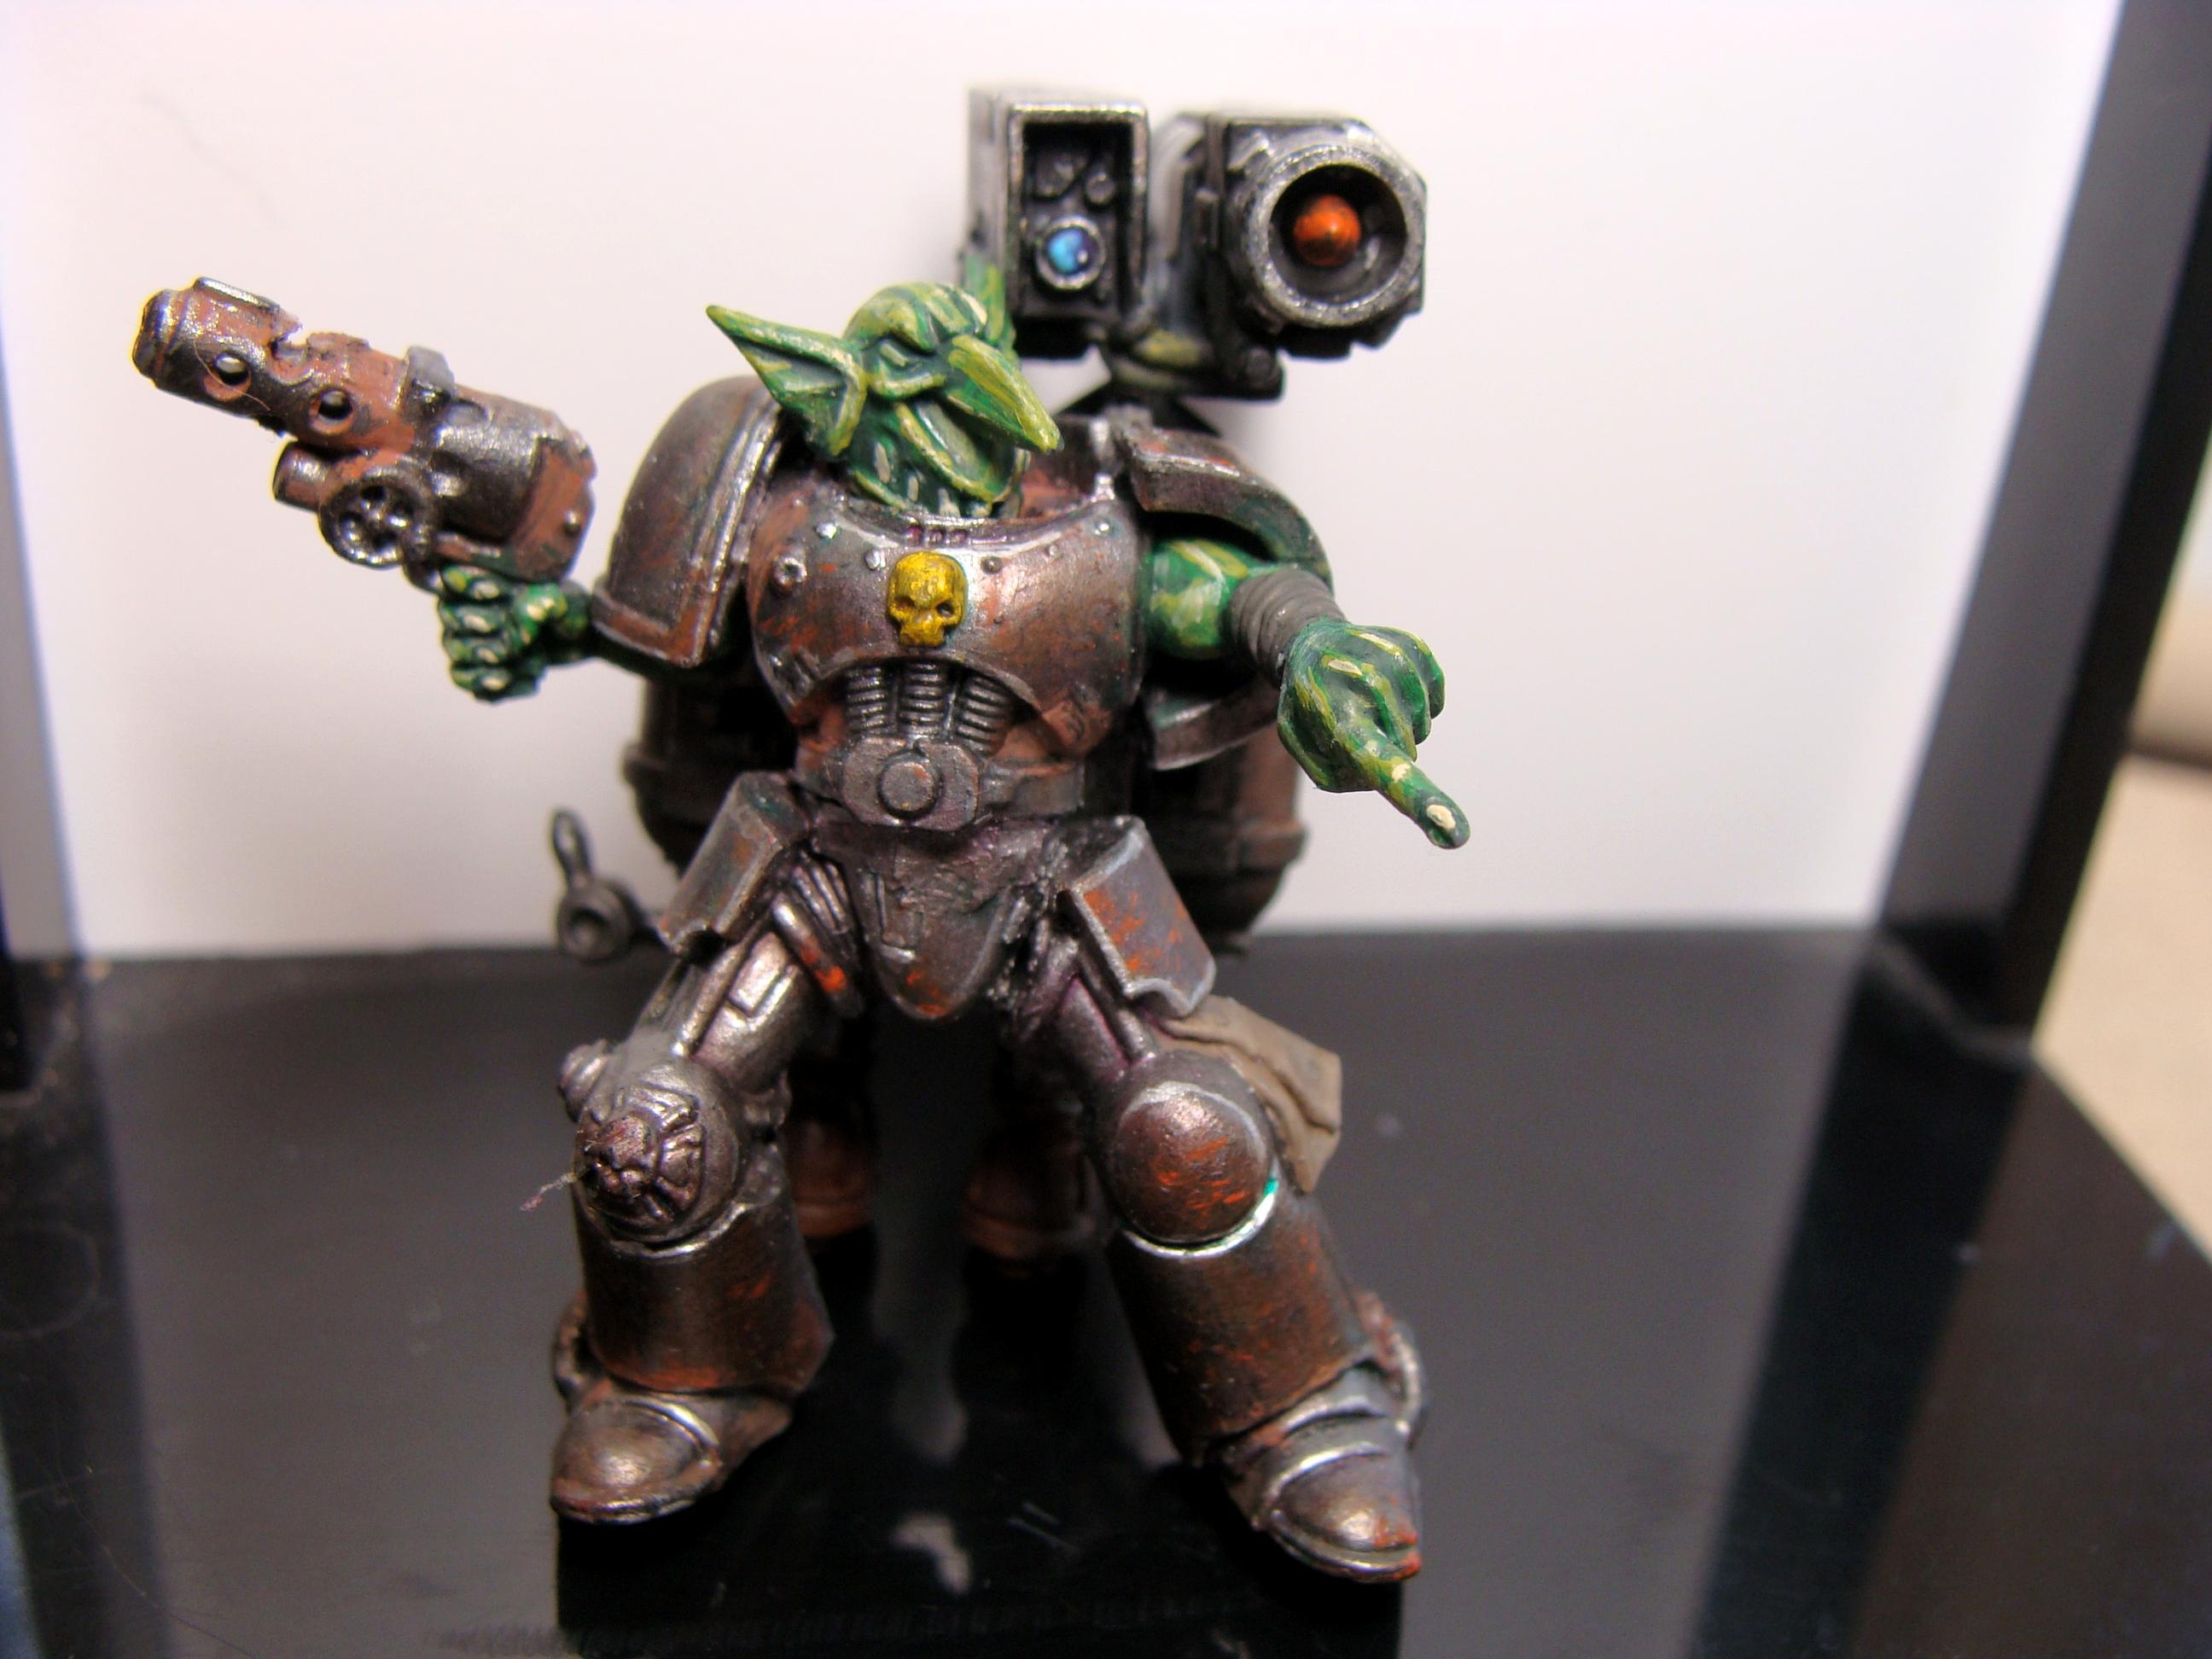 Chaos Space Marines, Goblins, Warhammer 40,000